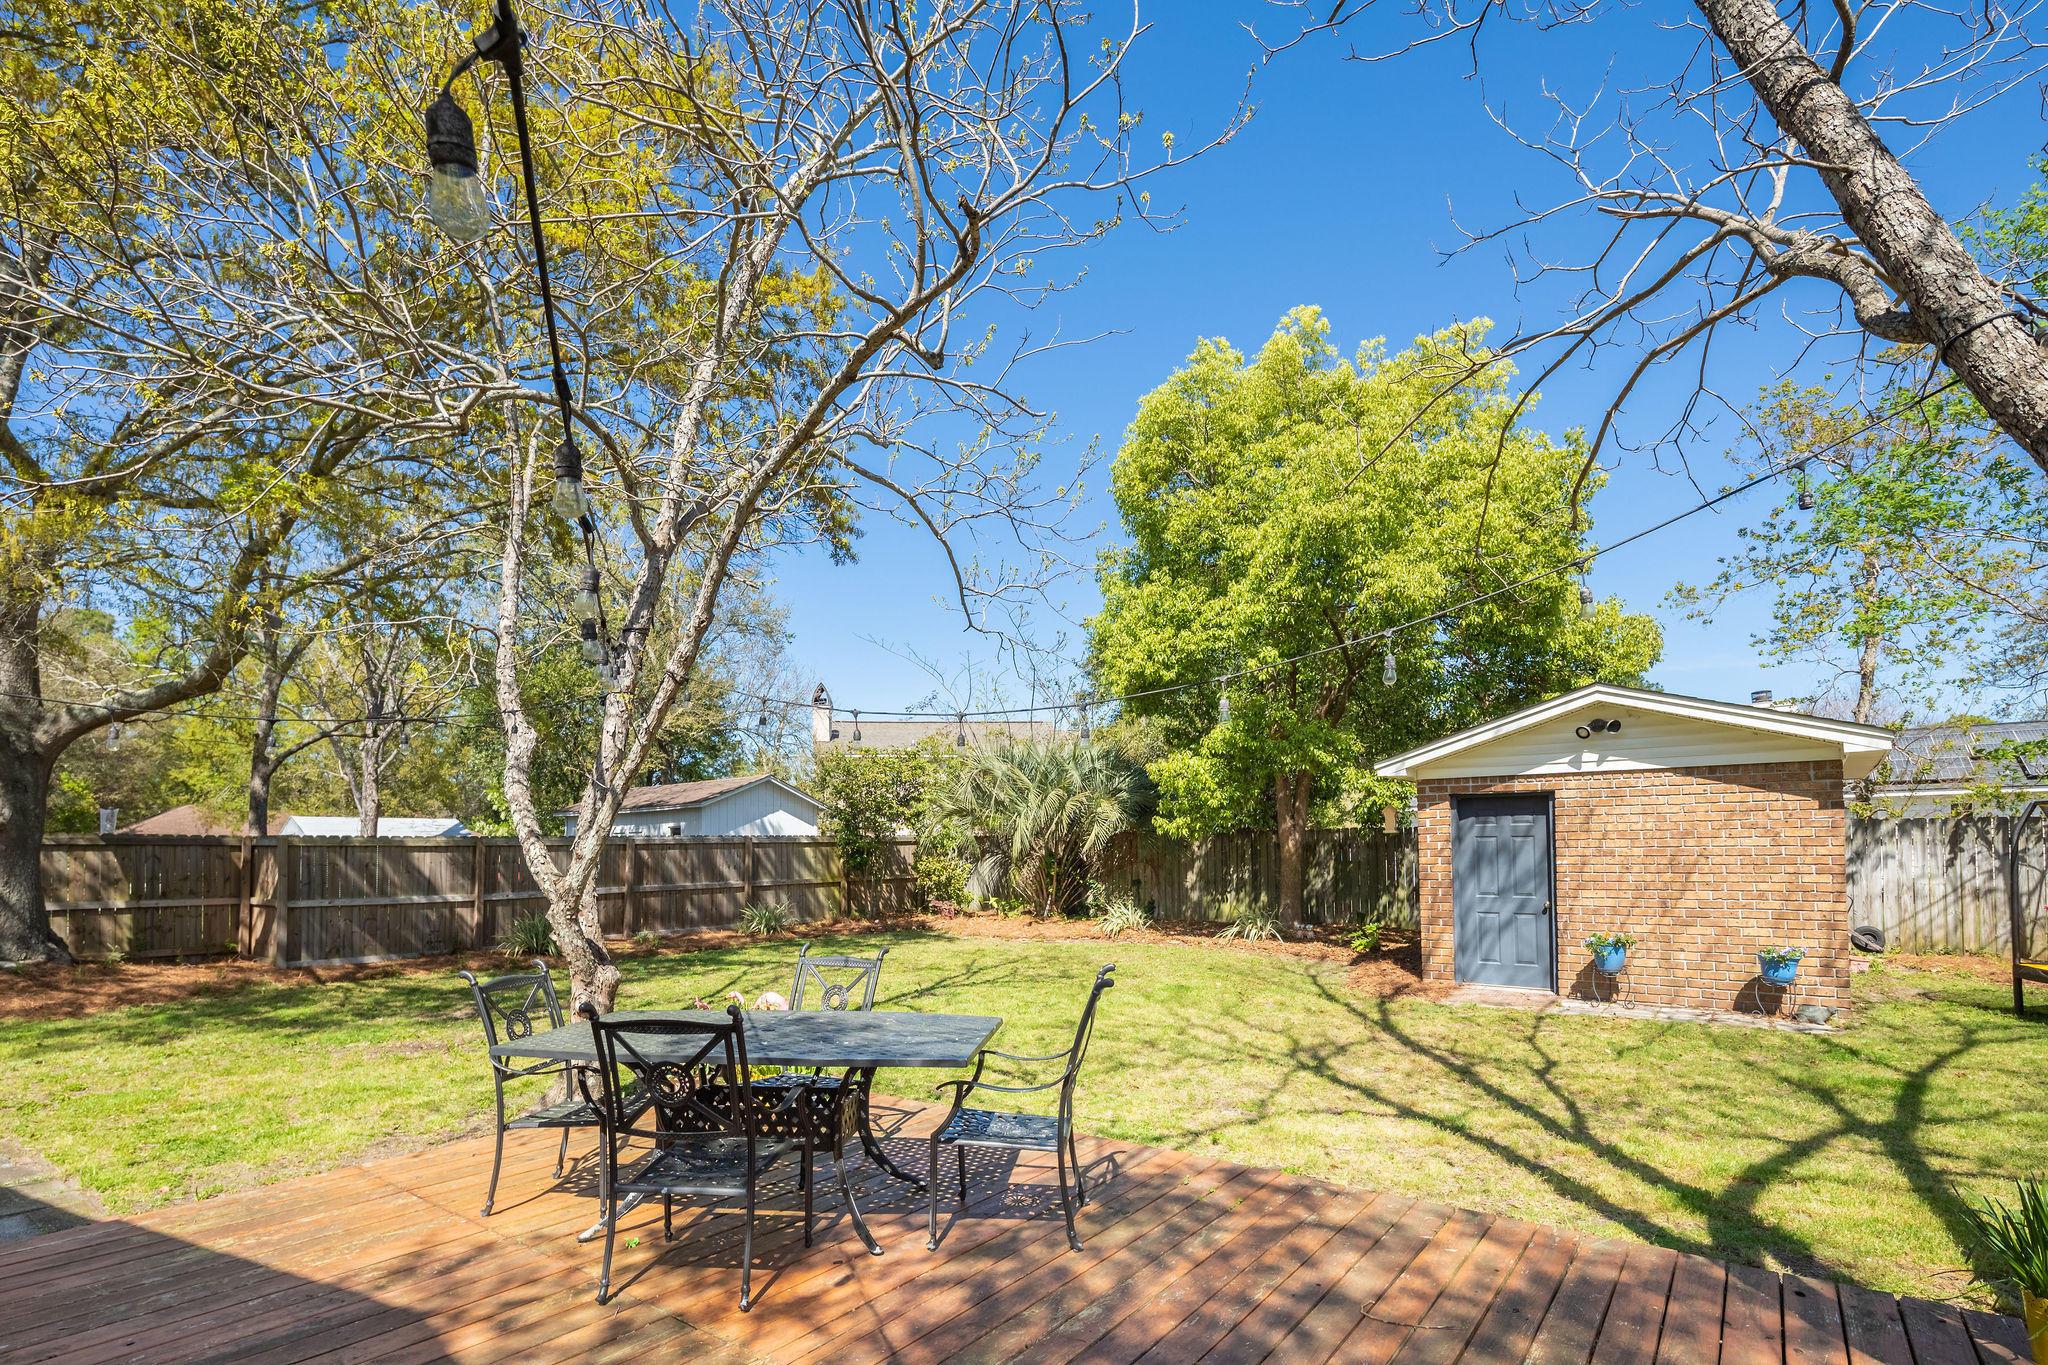 Cooper Estates Homes For Sale - 1058 Cottingham, Mount Pleasant, SC - 4